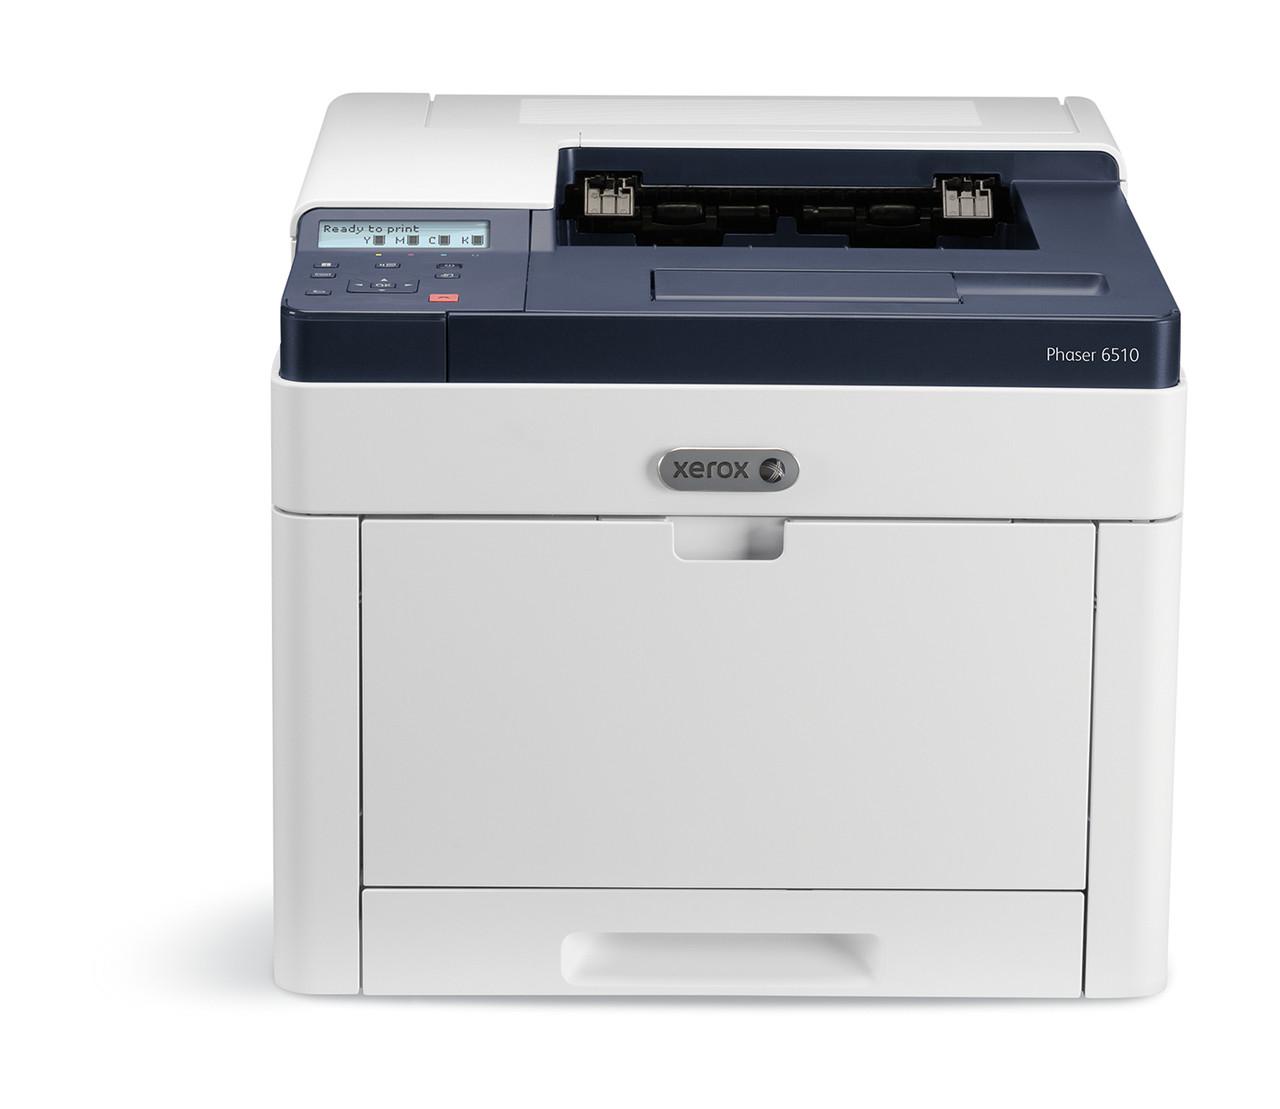 Xerox 6510/DNI Phaser Laser Printer - Color